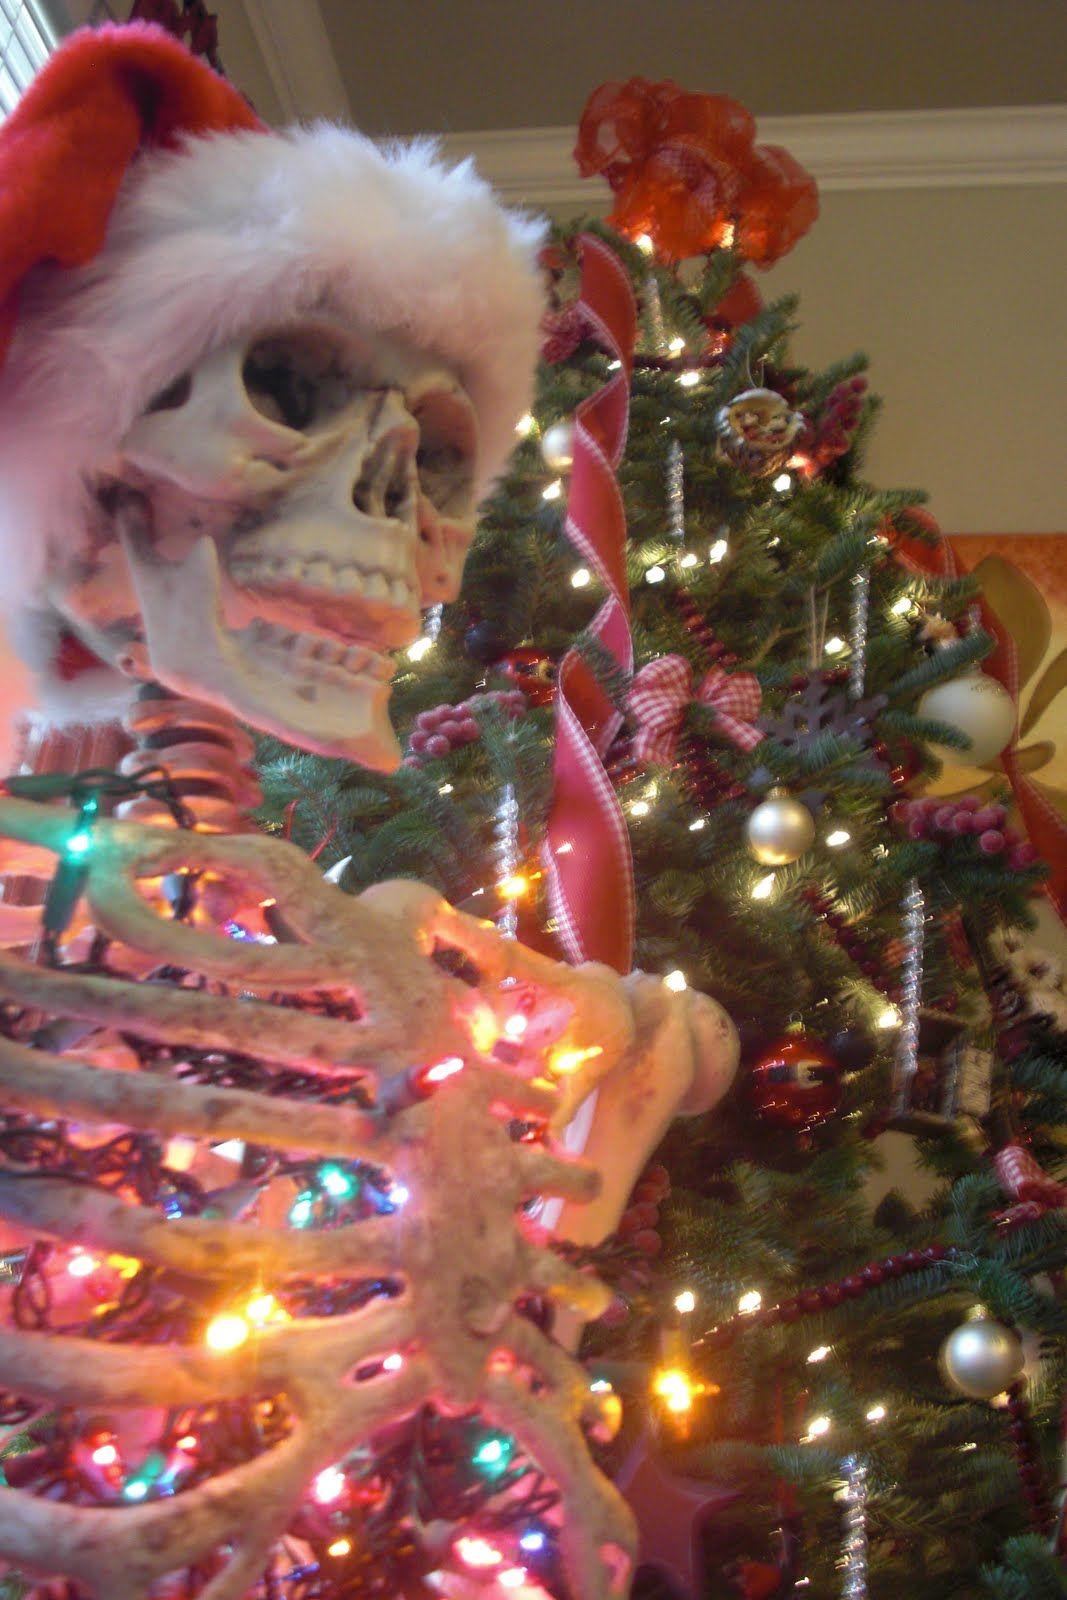 Christmas Skeleton.Everyone Needs An Articulated Skeleton Full Of Christmas